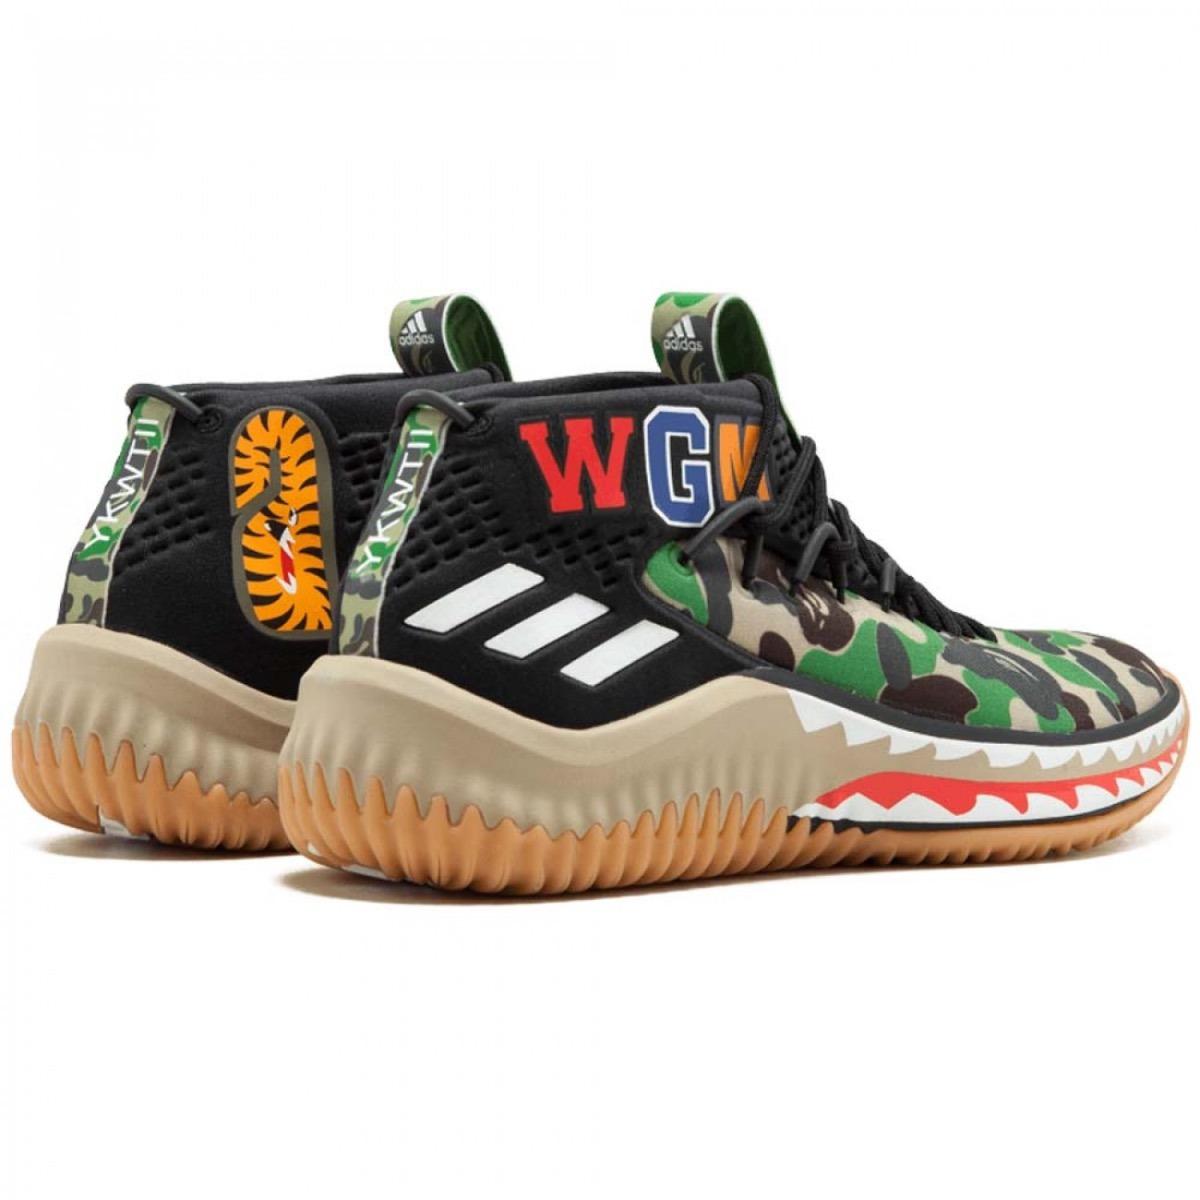 buy popular f655e 9882e Tênis adidas Dame 4 Bape Green Camo - Sneaker Damian Lillard